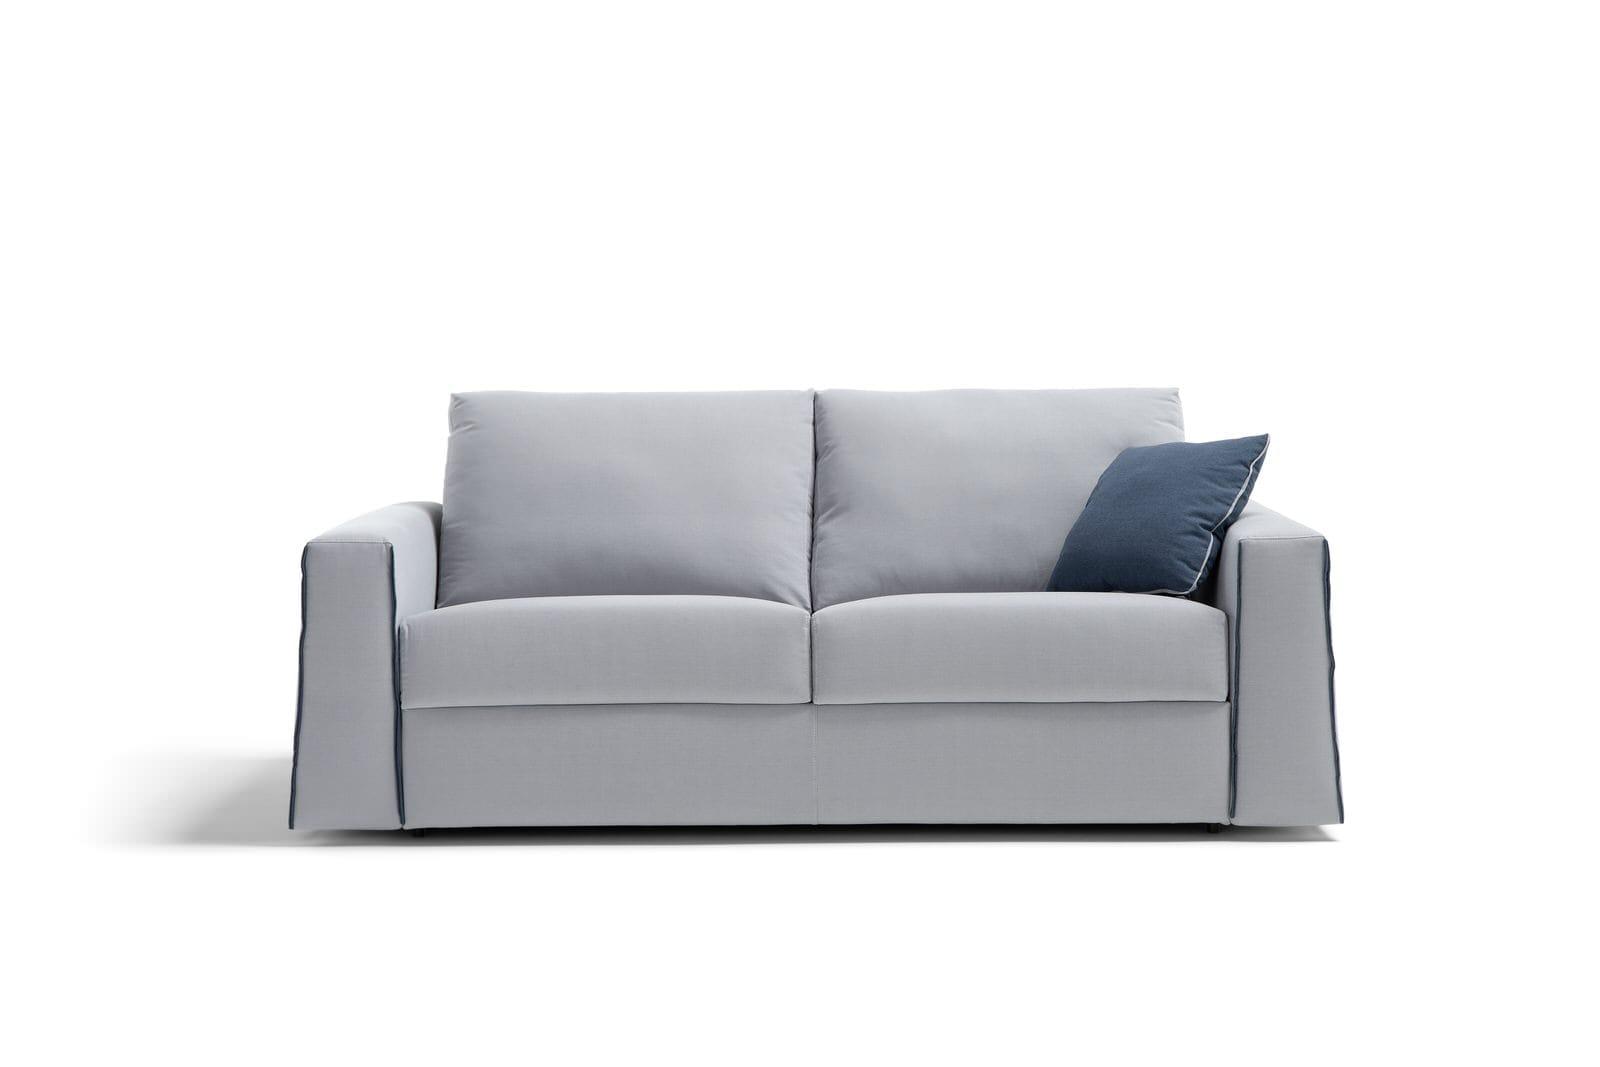 Sensational Temple Light Grey Full Sofa Bed By Pezzan Furniture Cjindustries Chair Design For Home Cjindustriesco